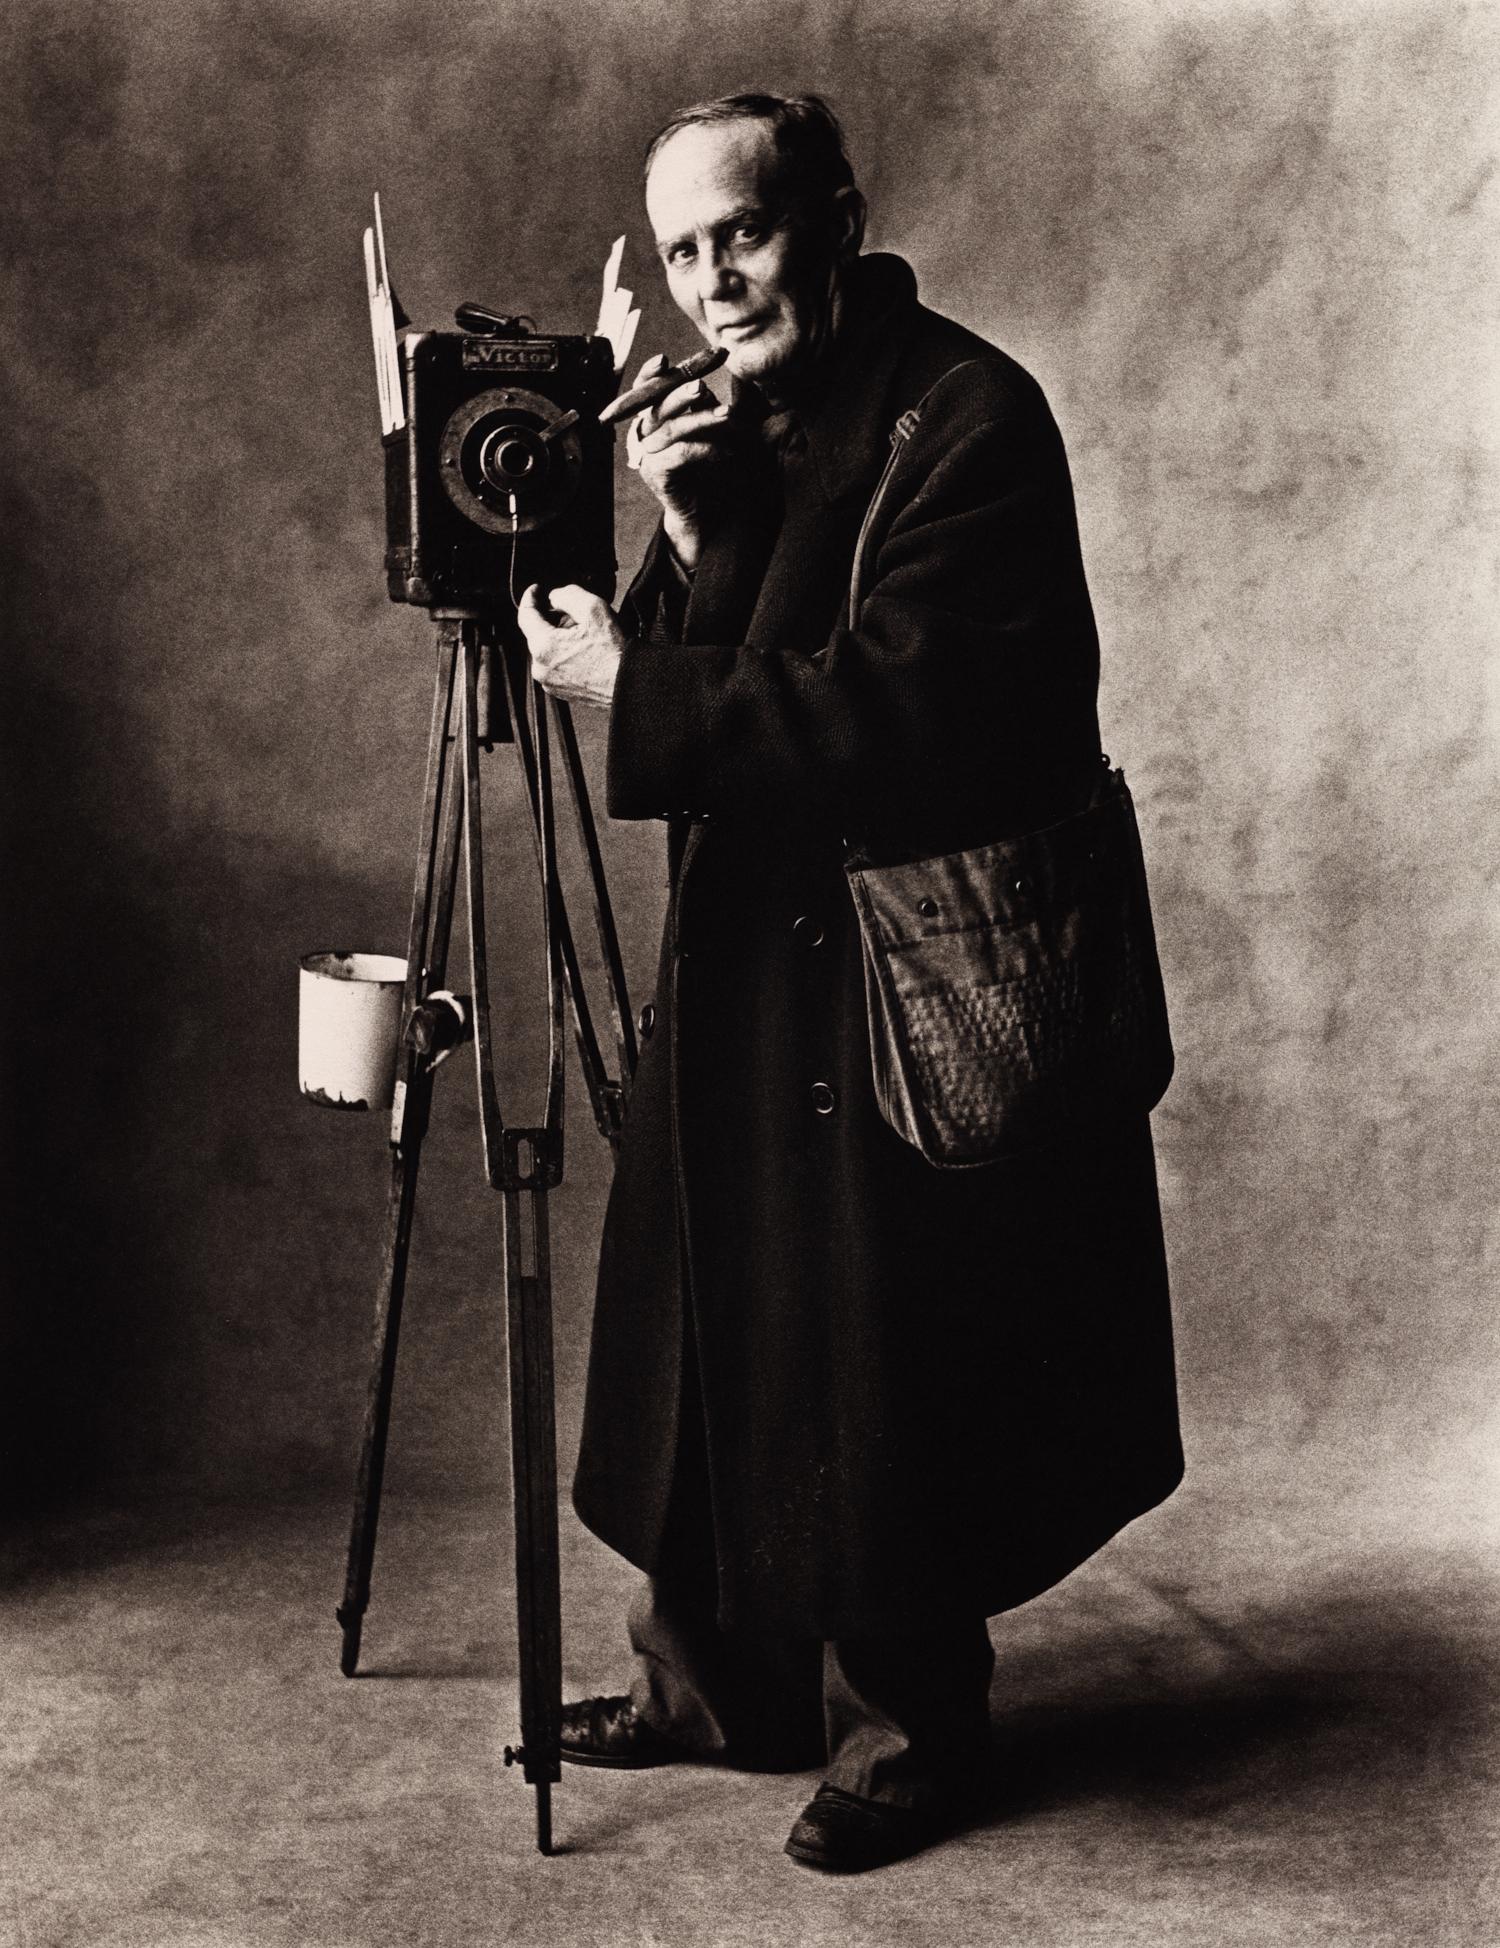 Street Photographer (A) , New York, 1951 Platinum-palladium print © Condé Nast